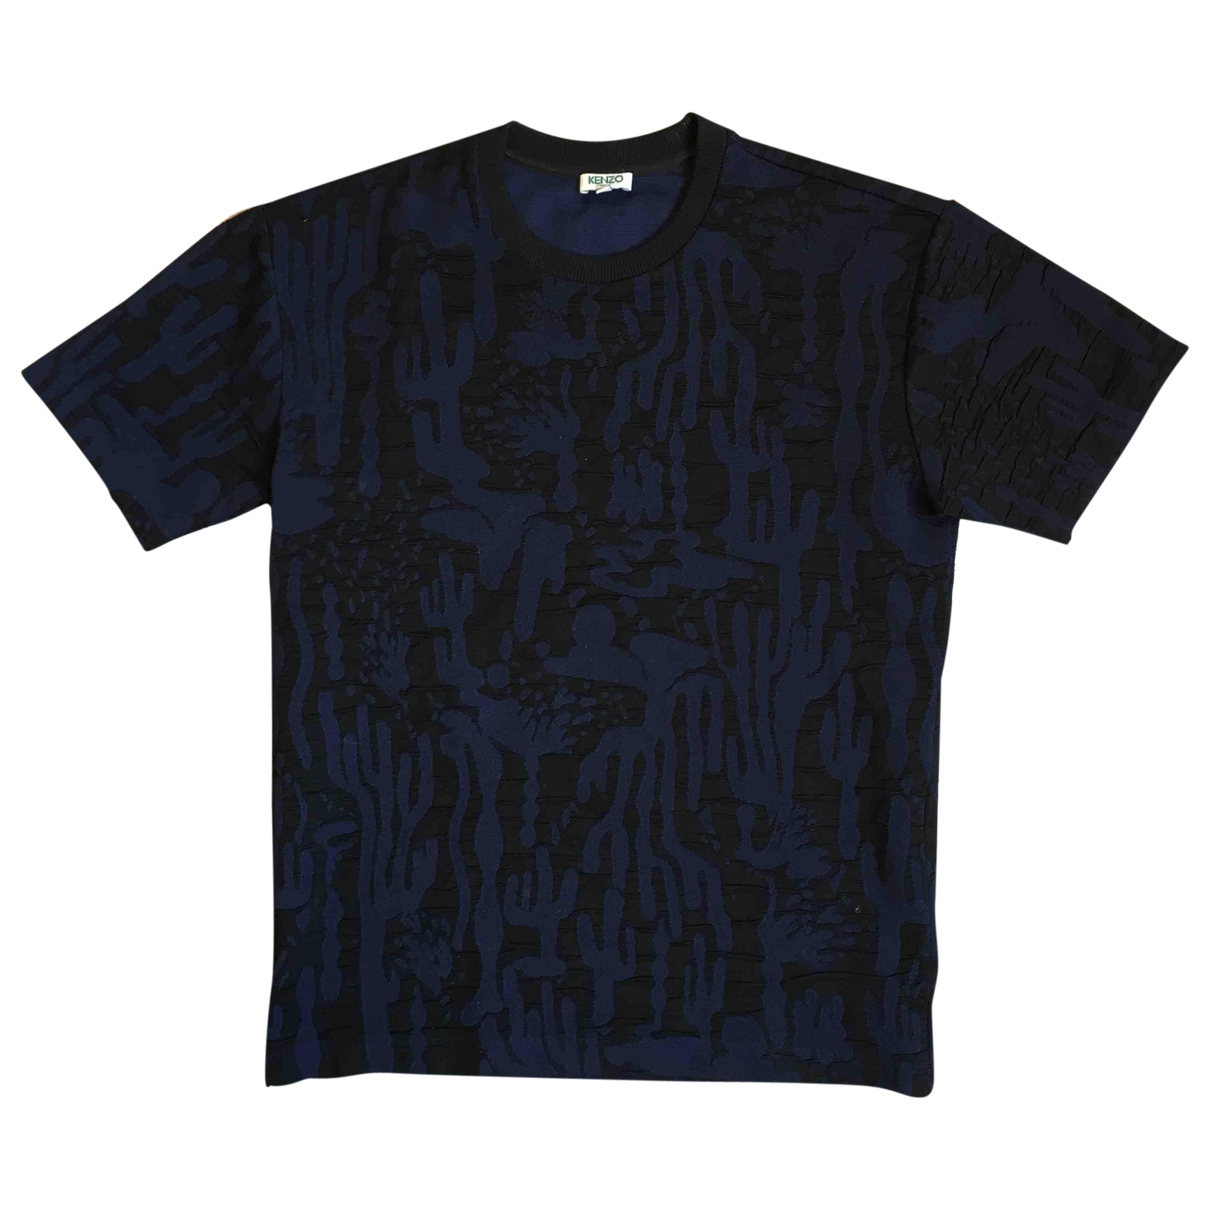 Kenzo - Tee shirts   pour homme - marine